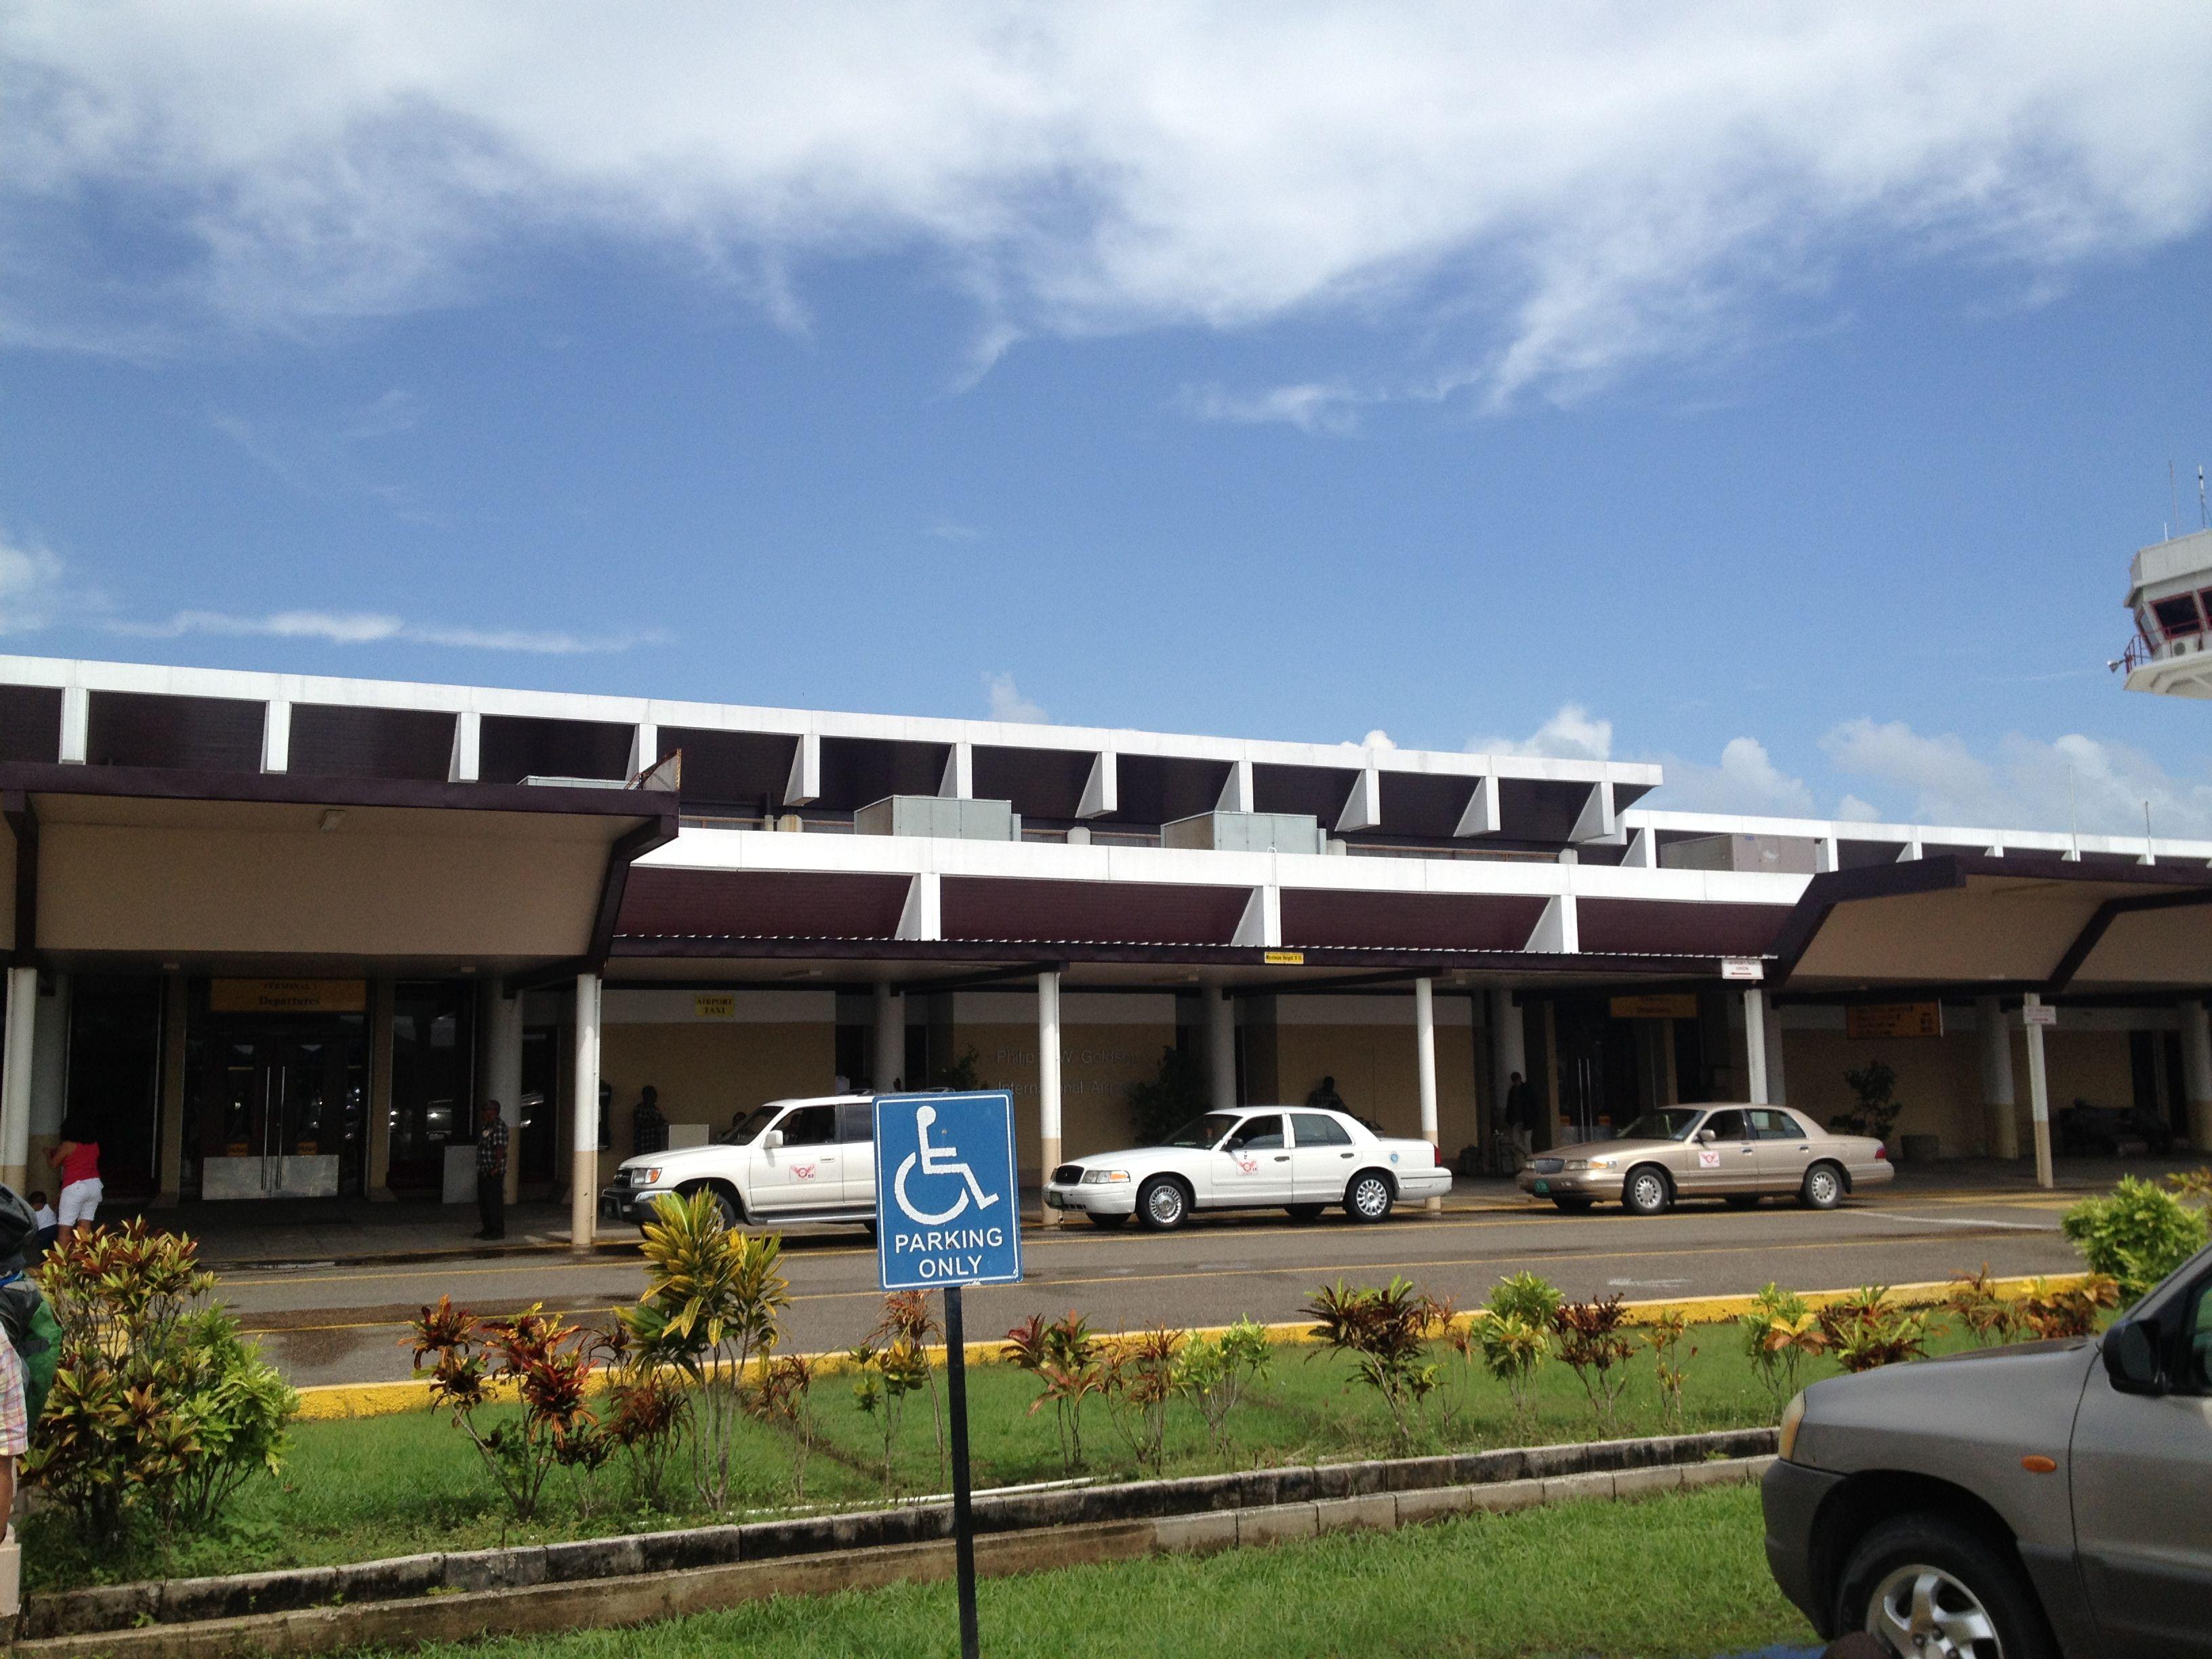 Belize city airport airport city belize city belize